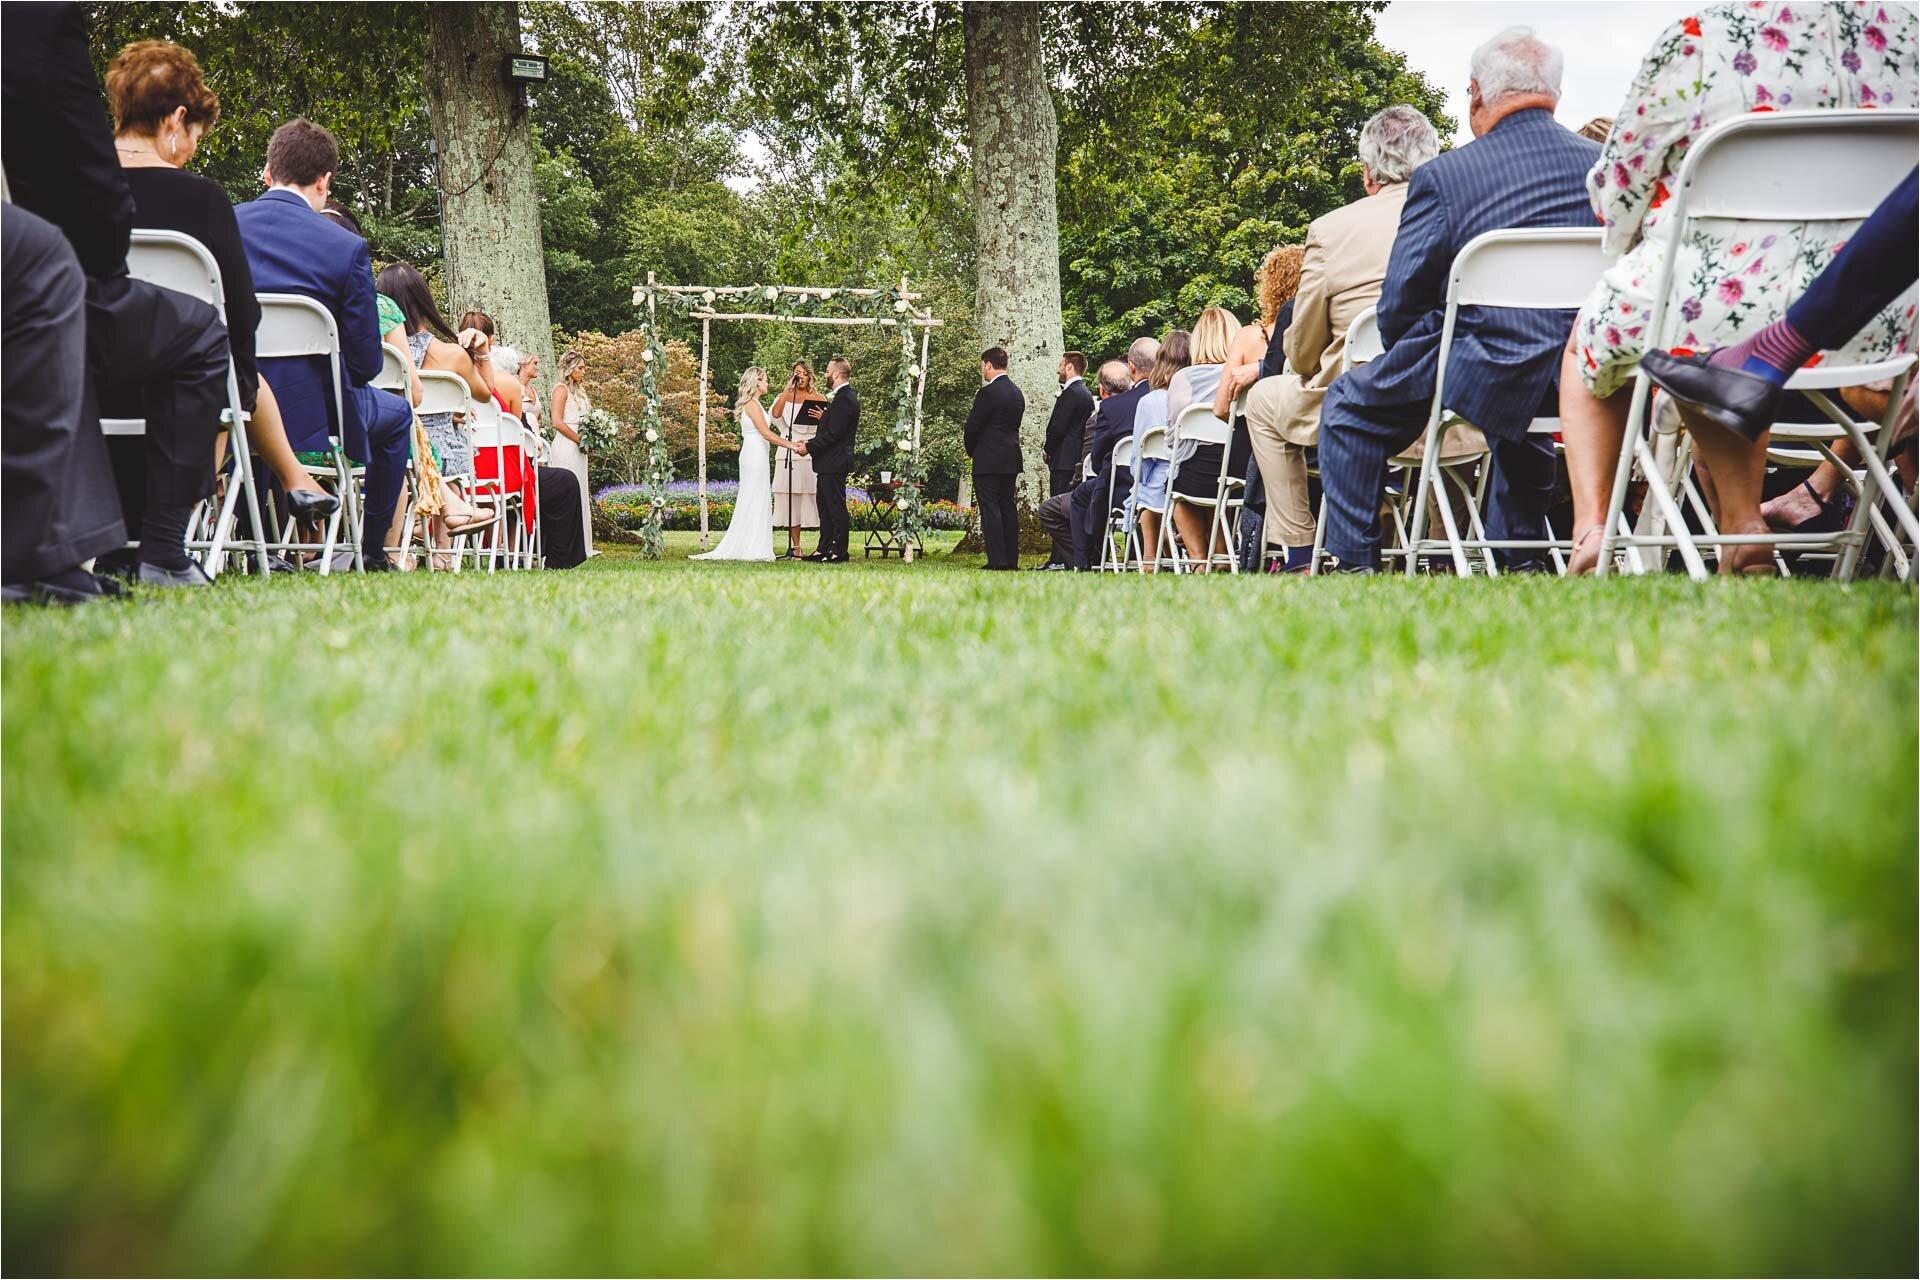 racebrook-countryclub-wedding-photography-14.jpg